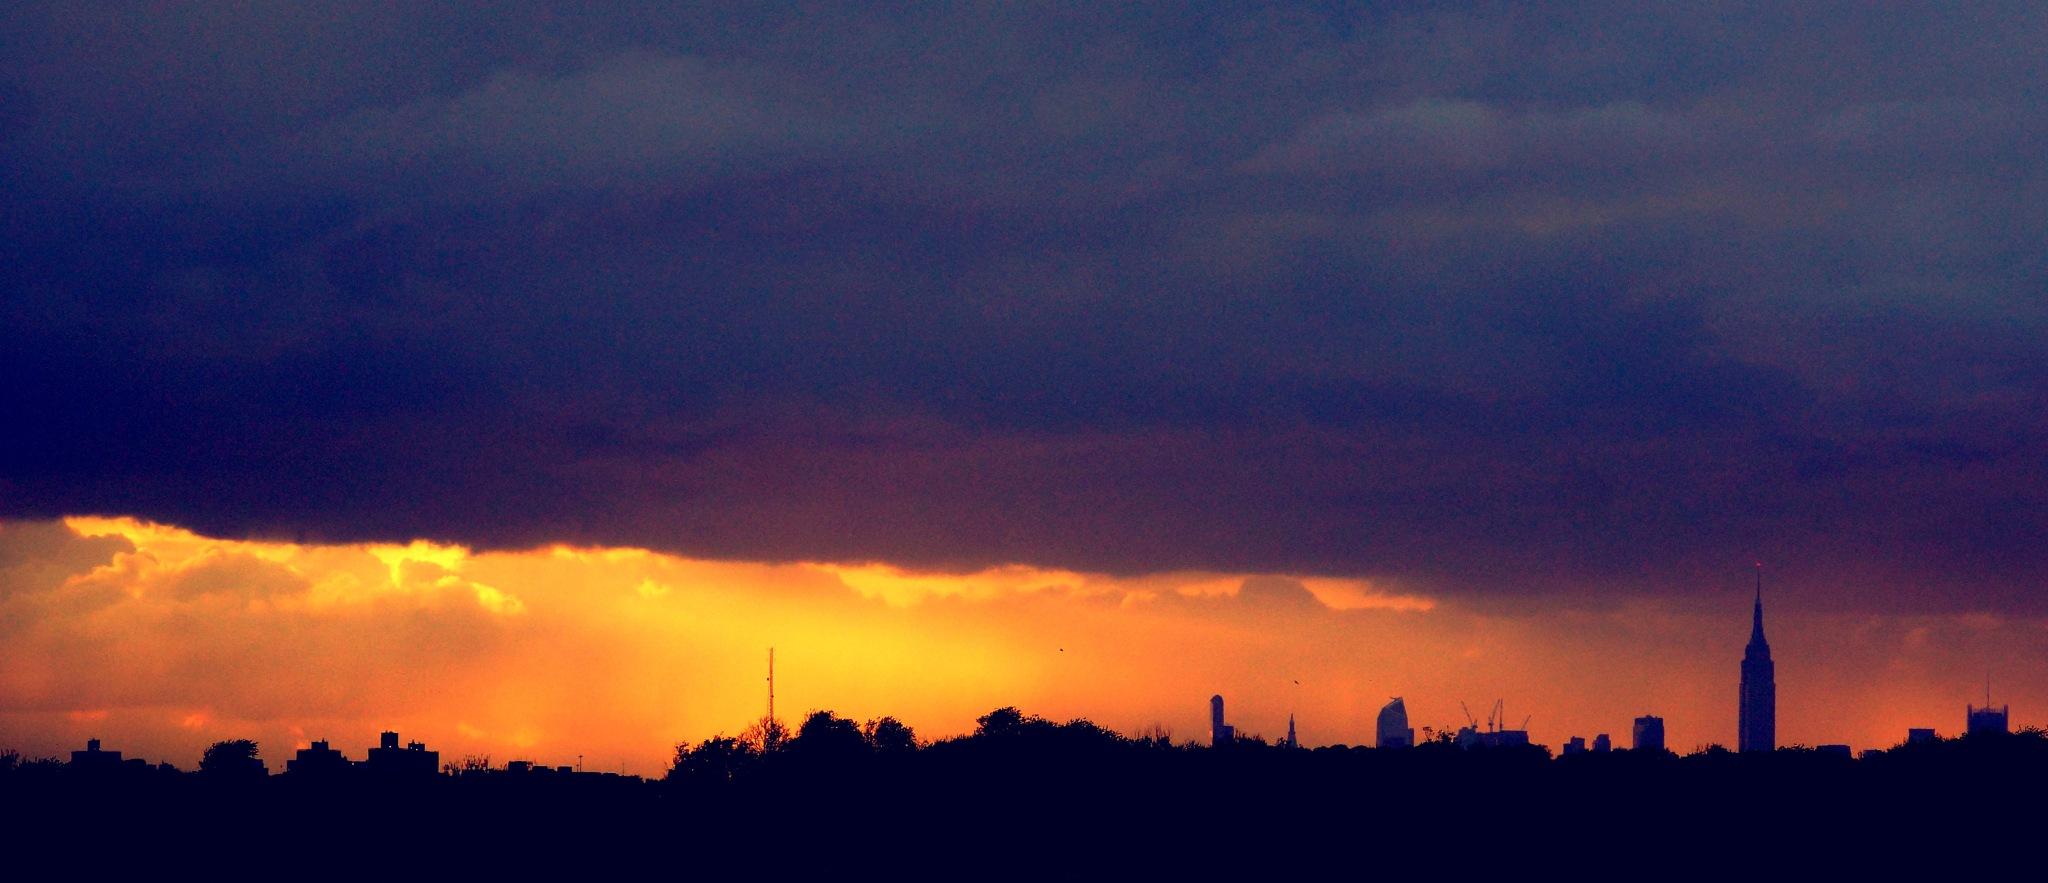 Storm Clouds over Manhattan by Troi Santos